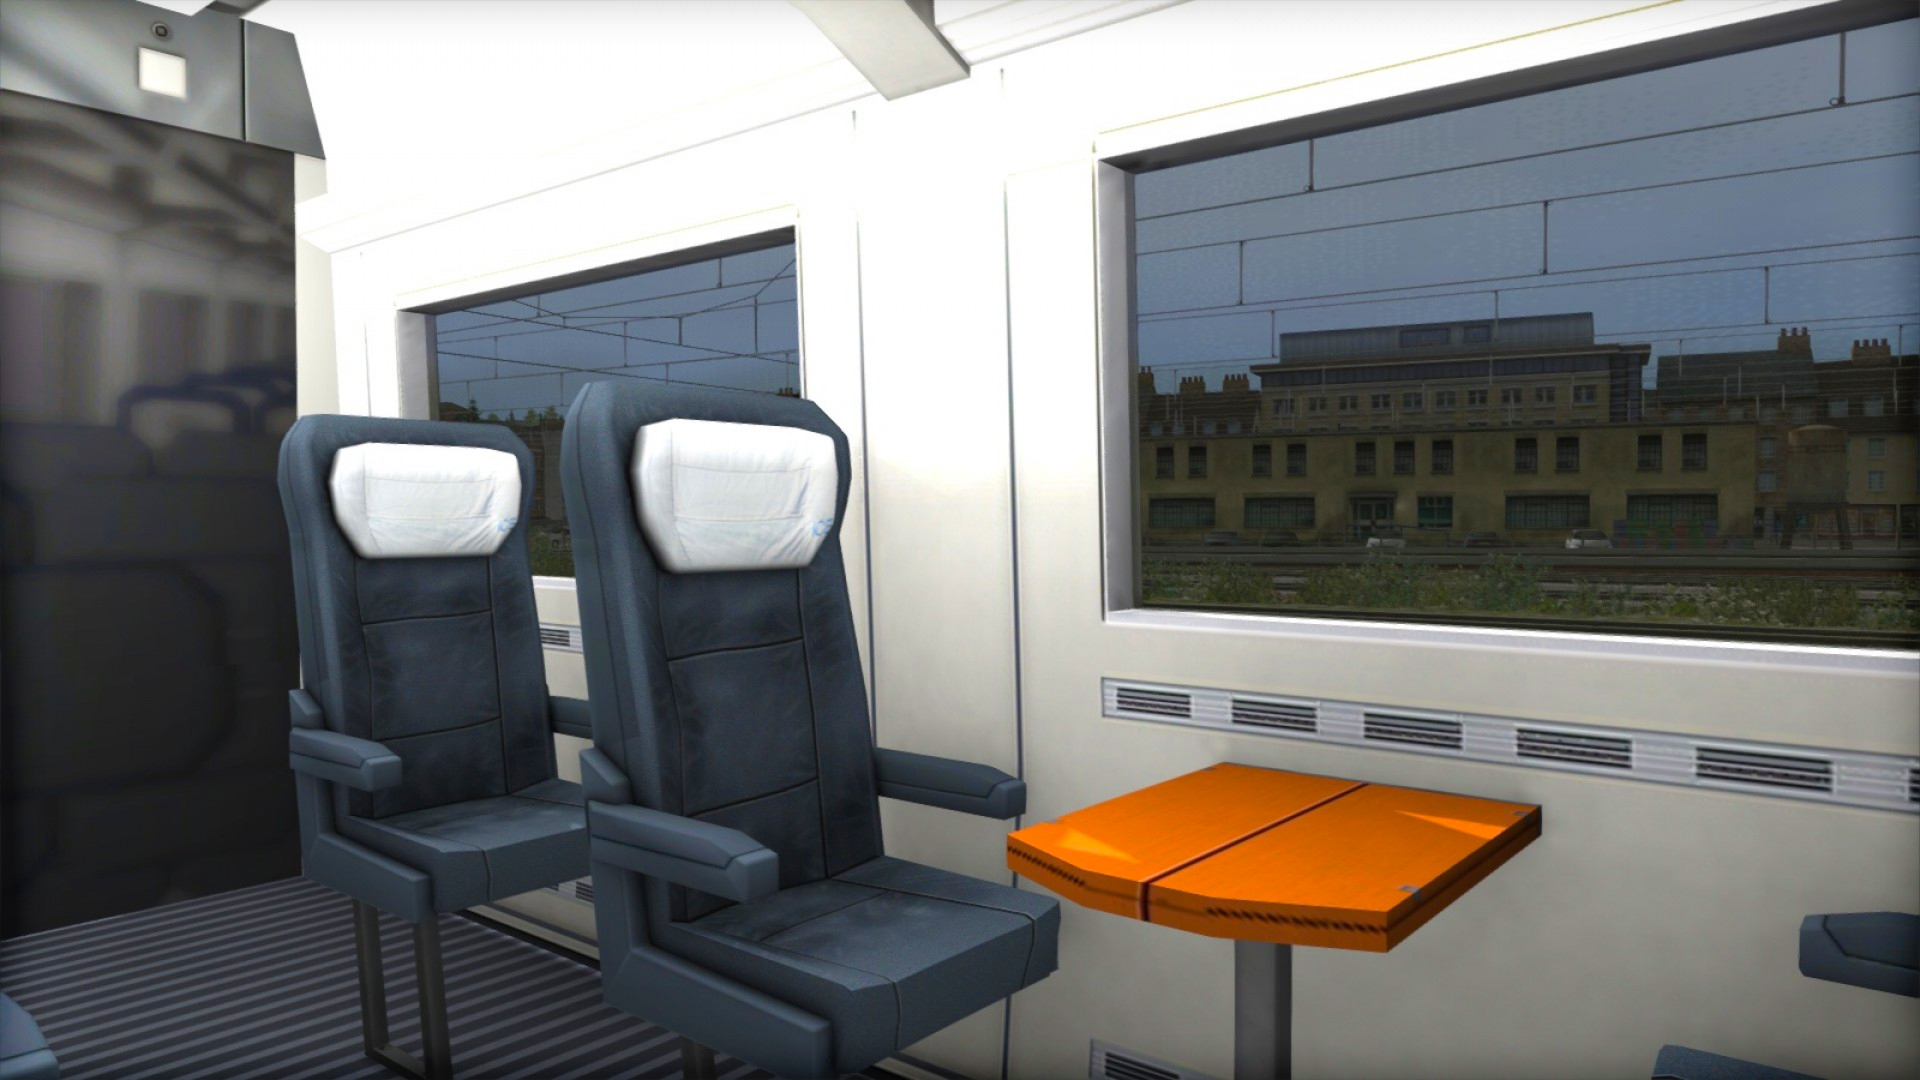 Train Simulator: DB ICE 1 EMU Add-On screenshot